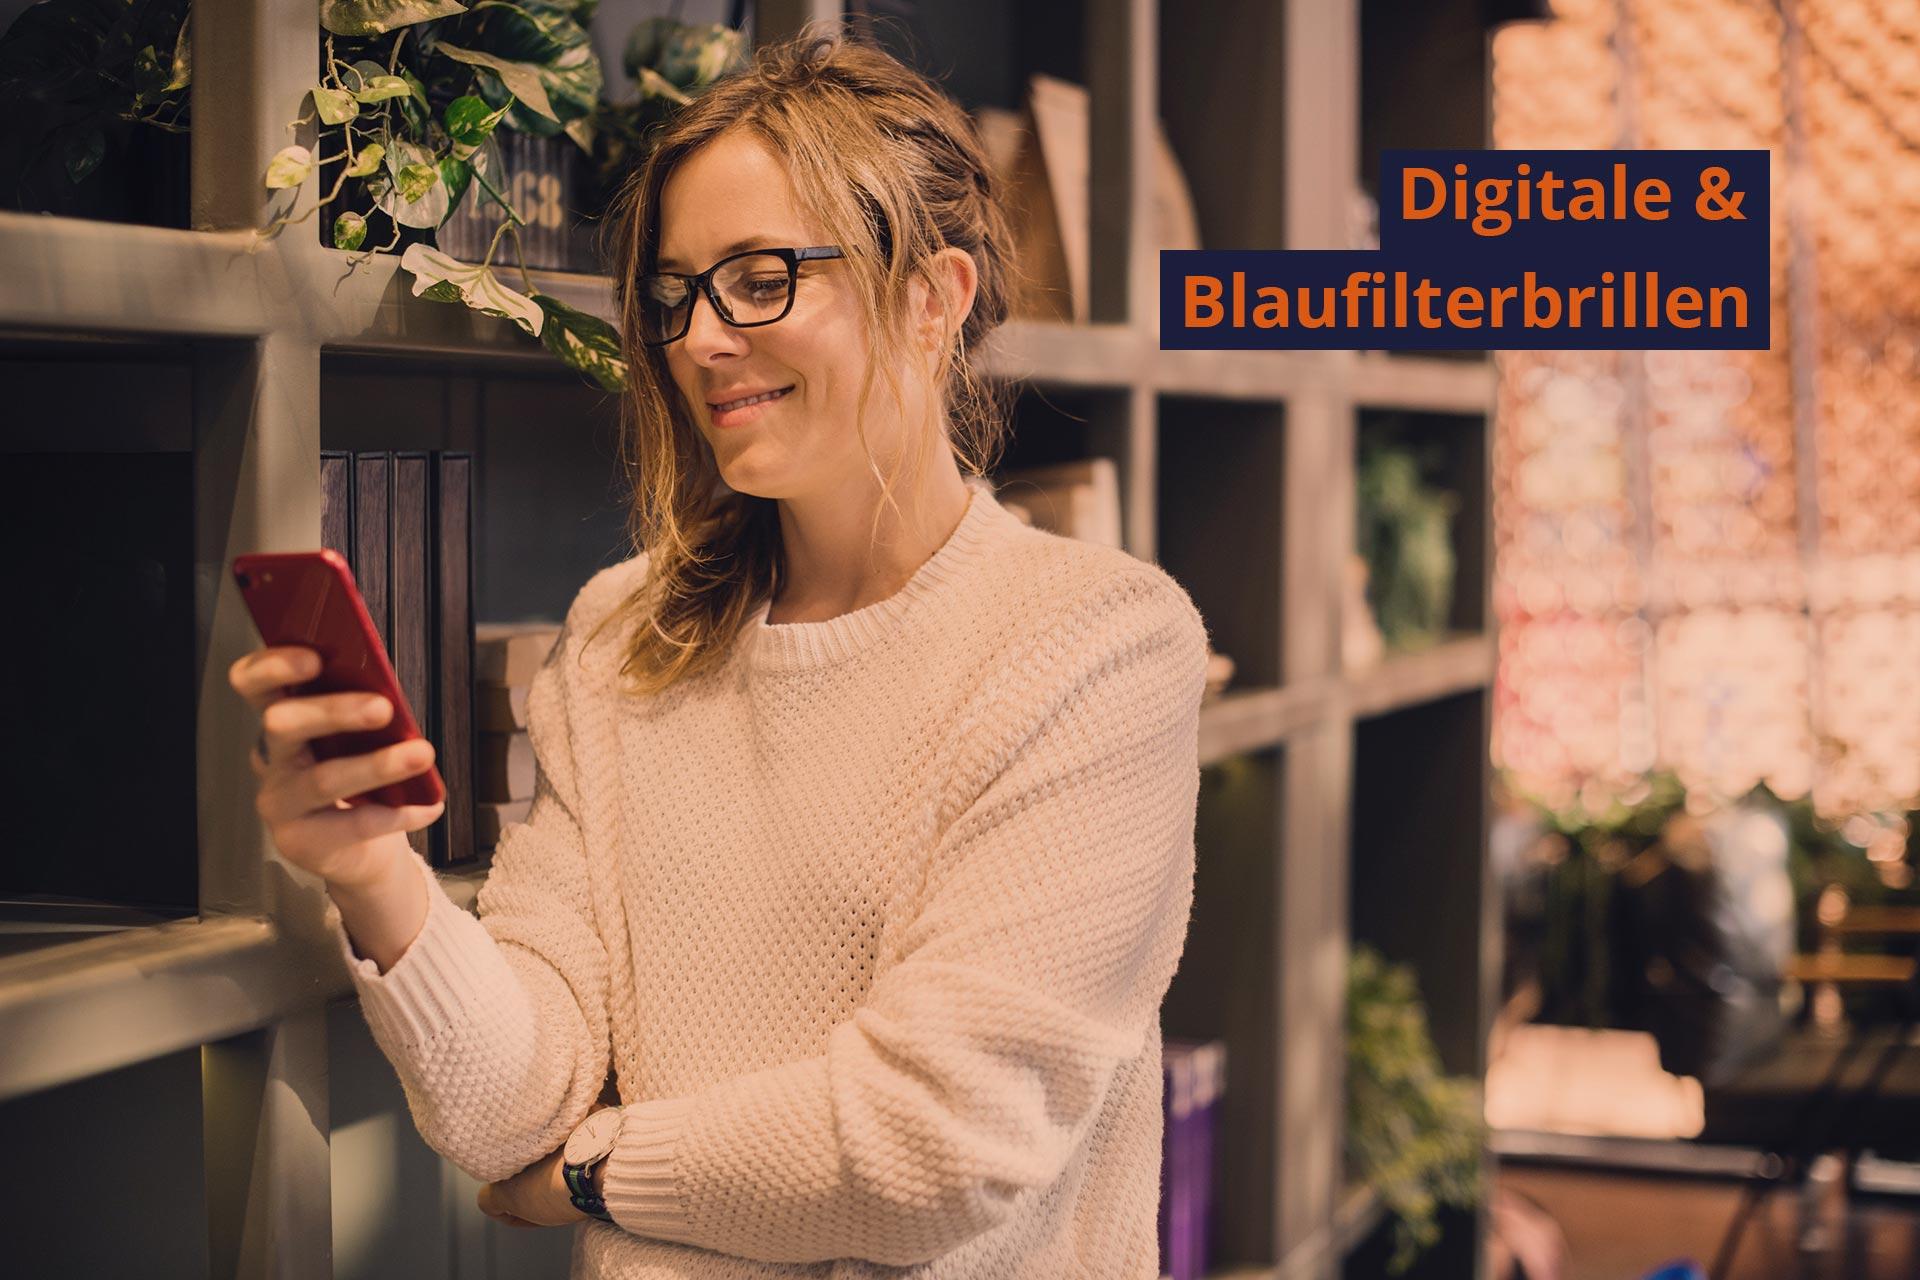 Digitale & Blaufilterbrillen